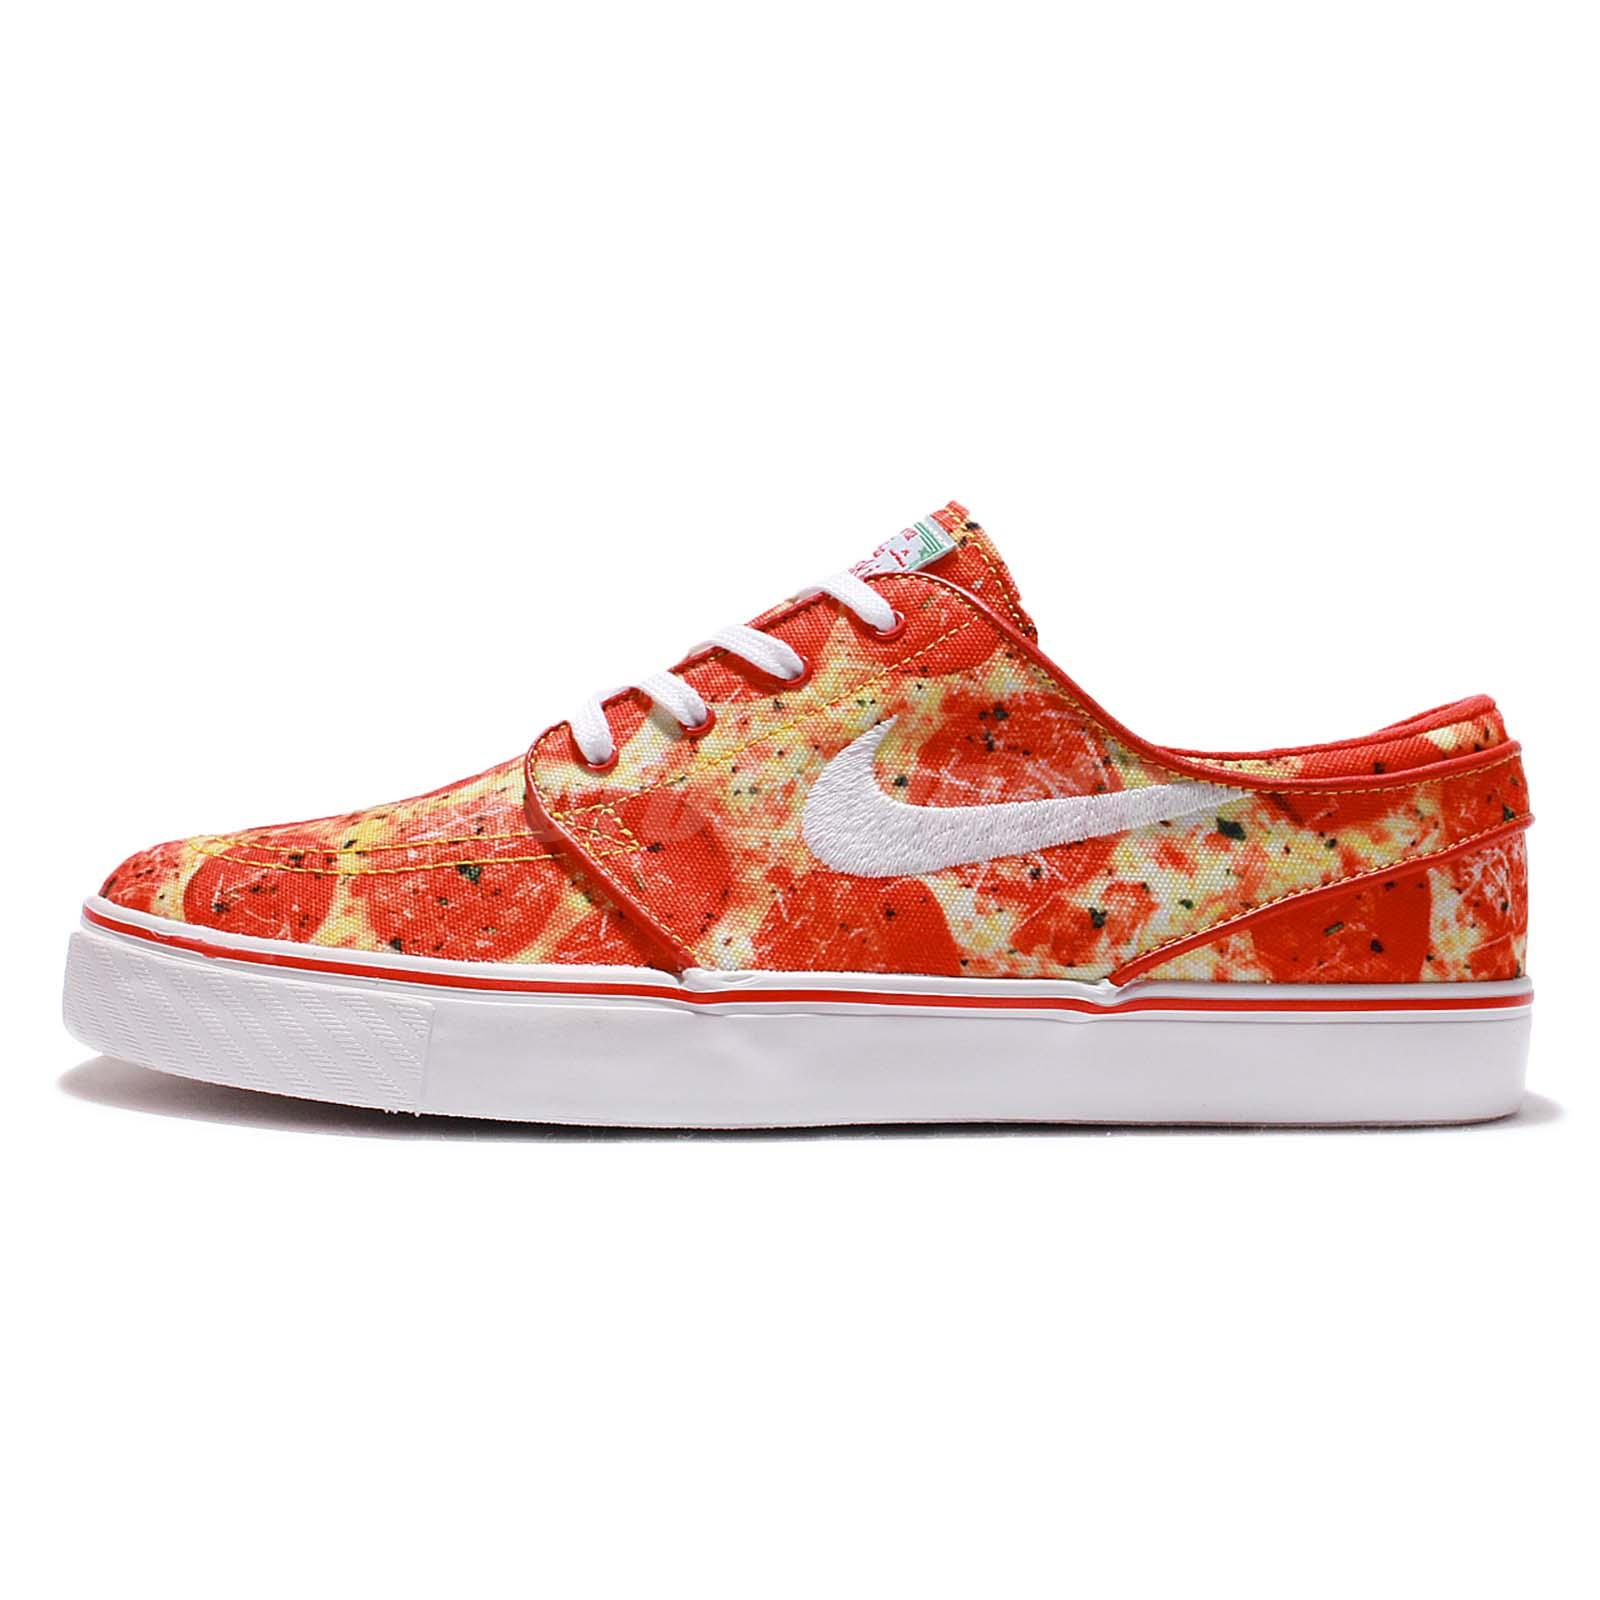 nike sb zoom stefan janoski sb skate shoes